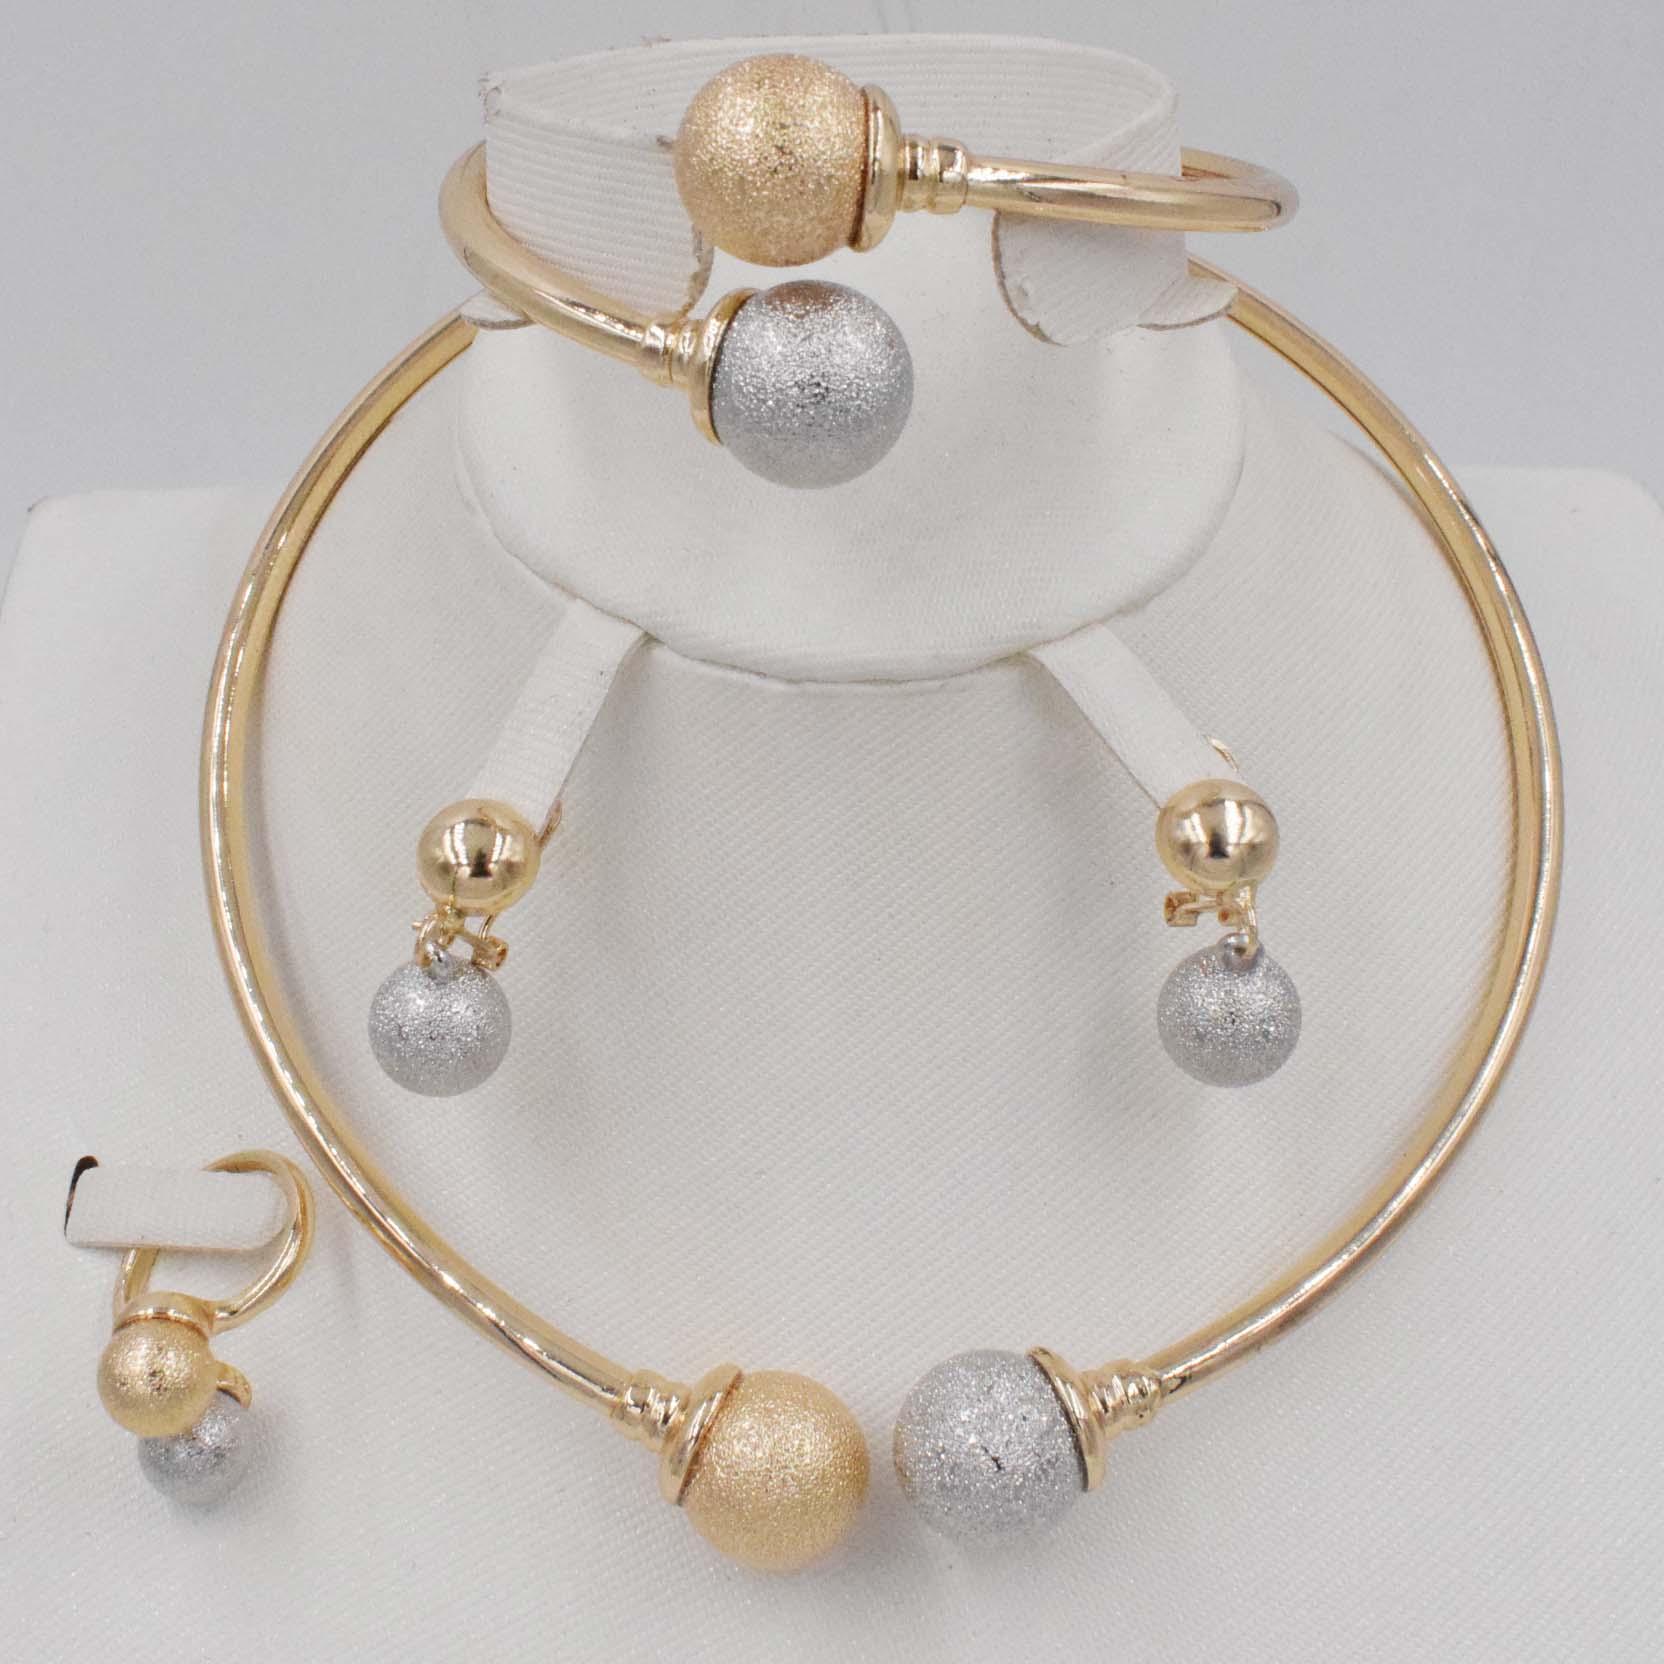 3 tones New High Fashion Dubai Jewelry Set  Nigerian Wedding African Beads Jewelry Sets